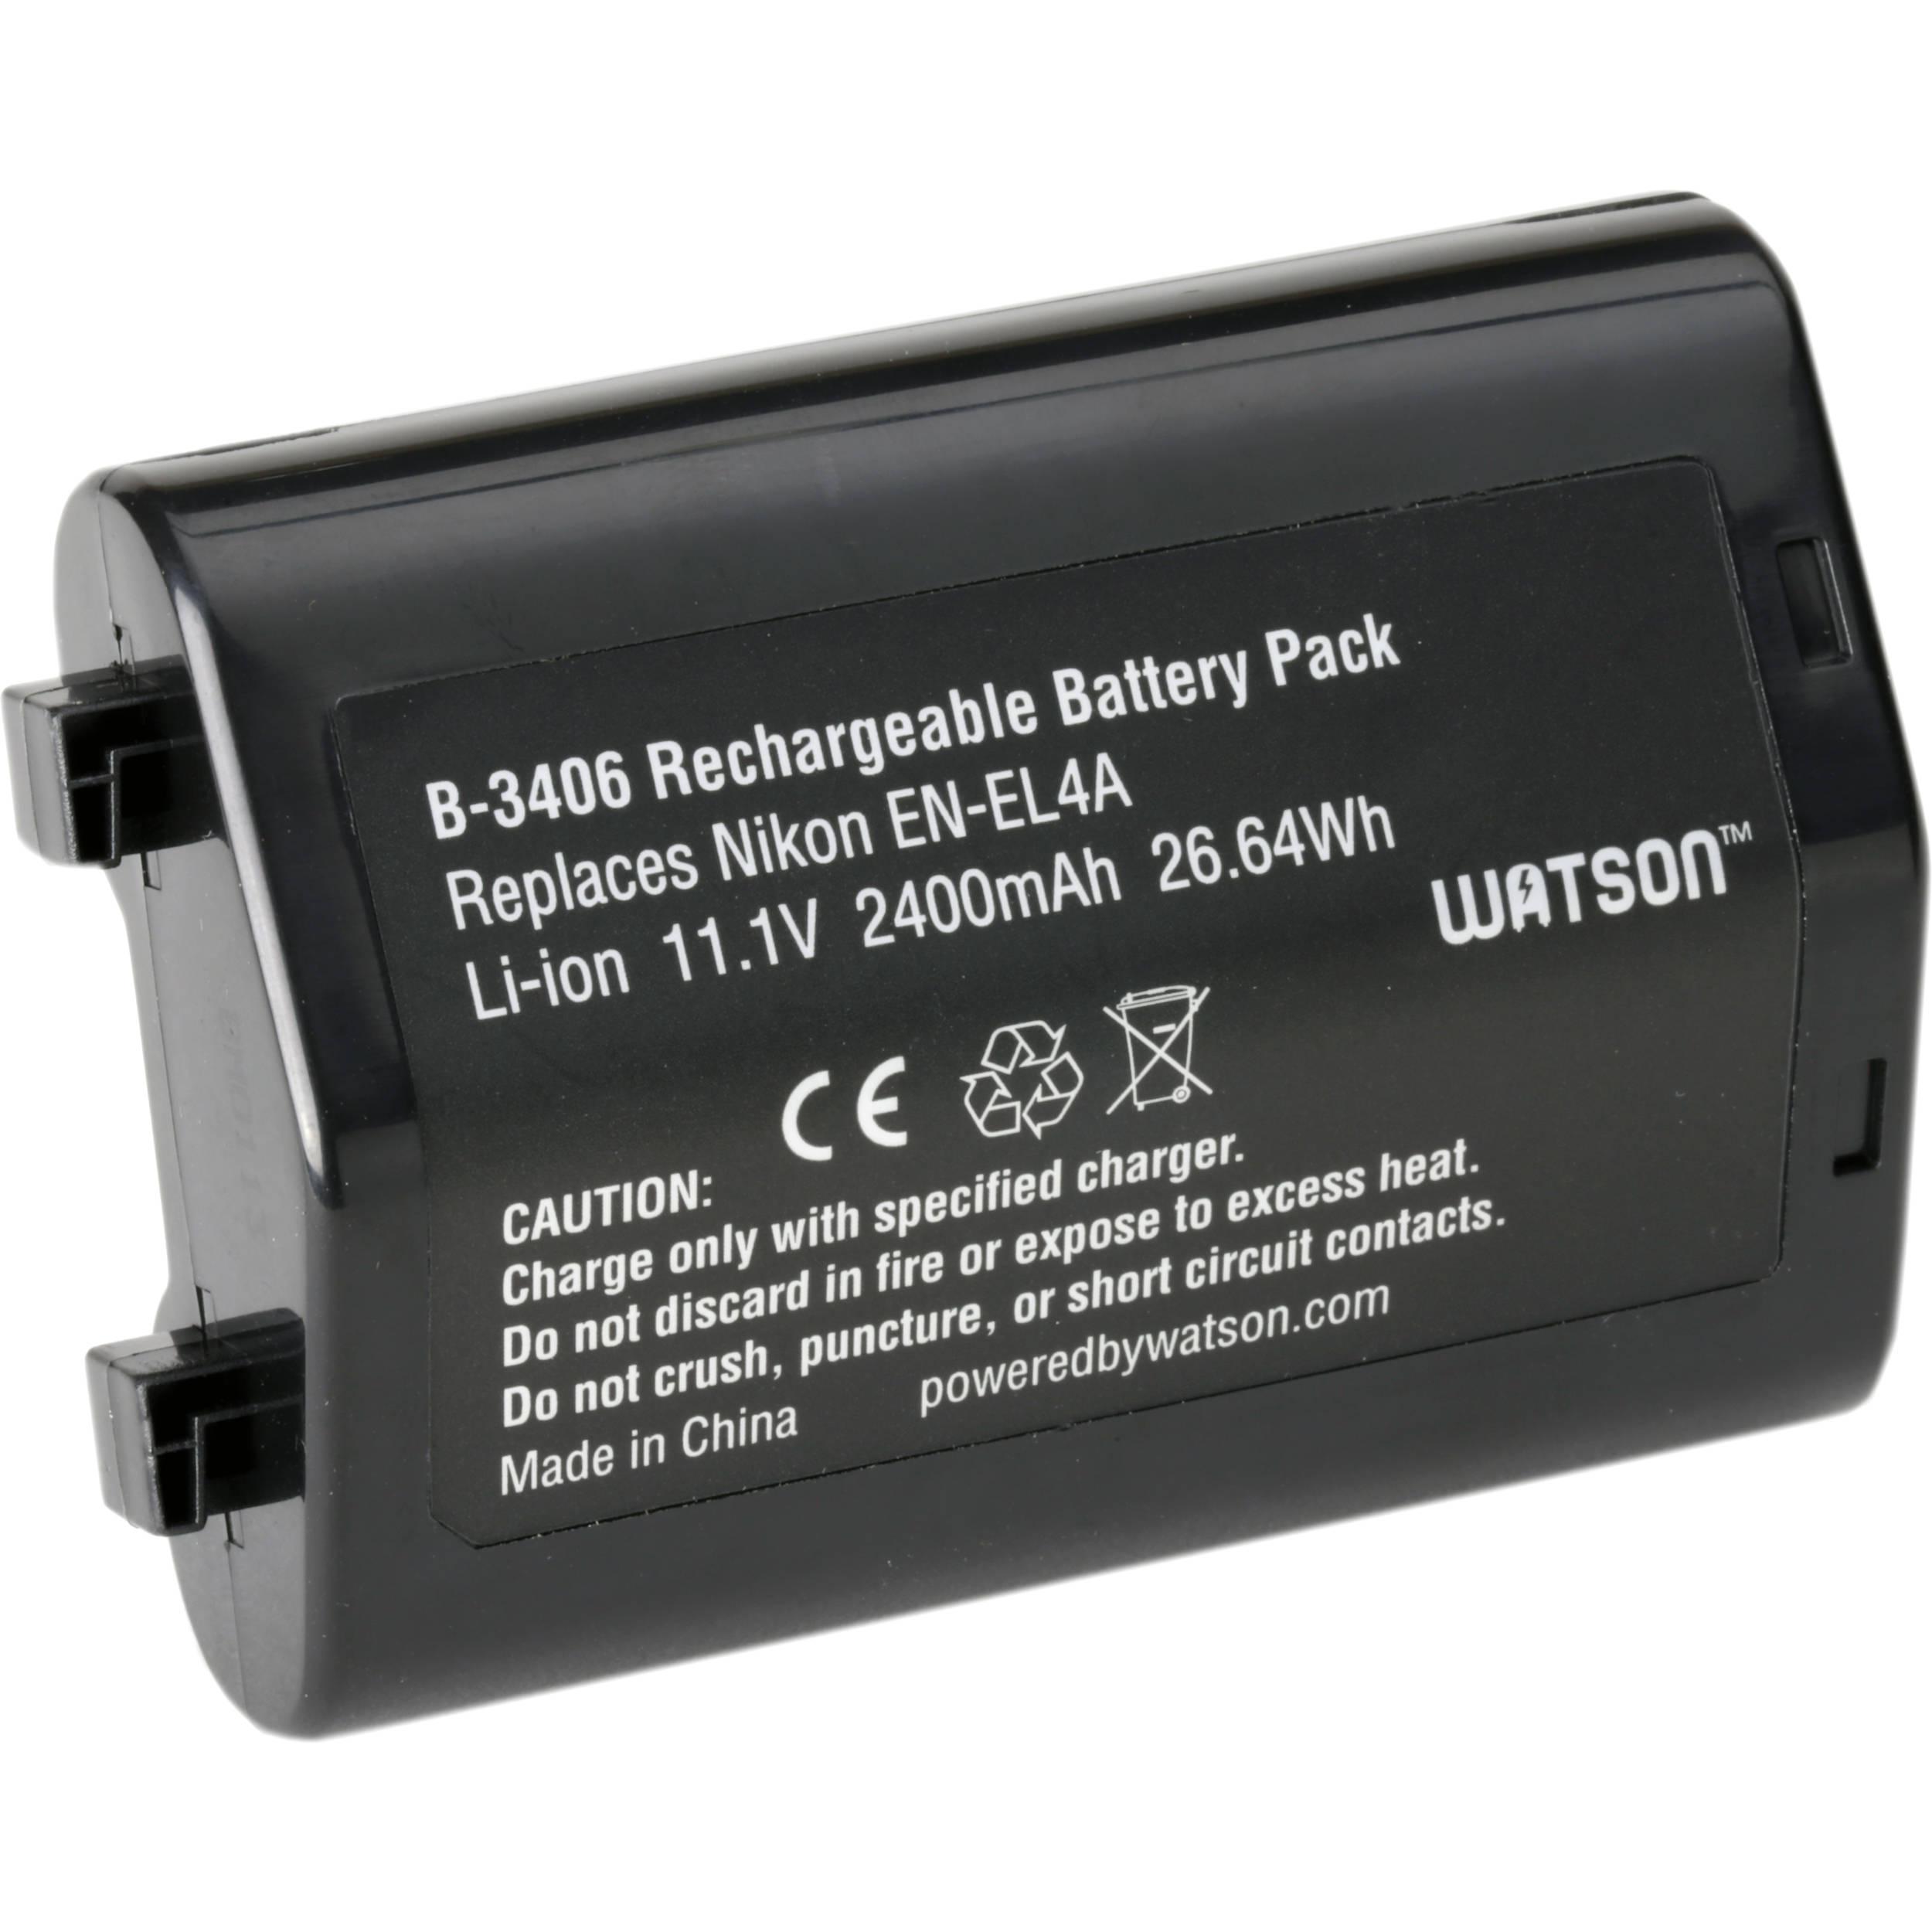 Lithium Ion Battery Pack Watson EN-EL4A ...